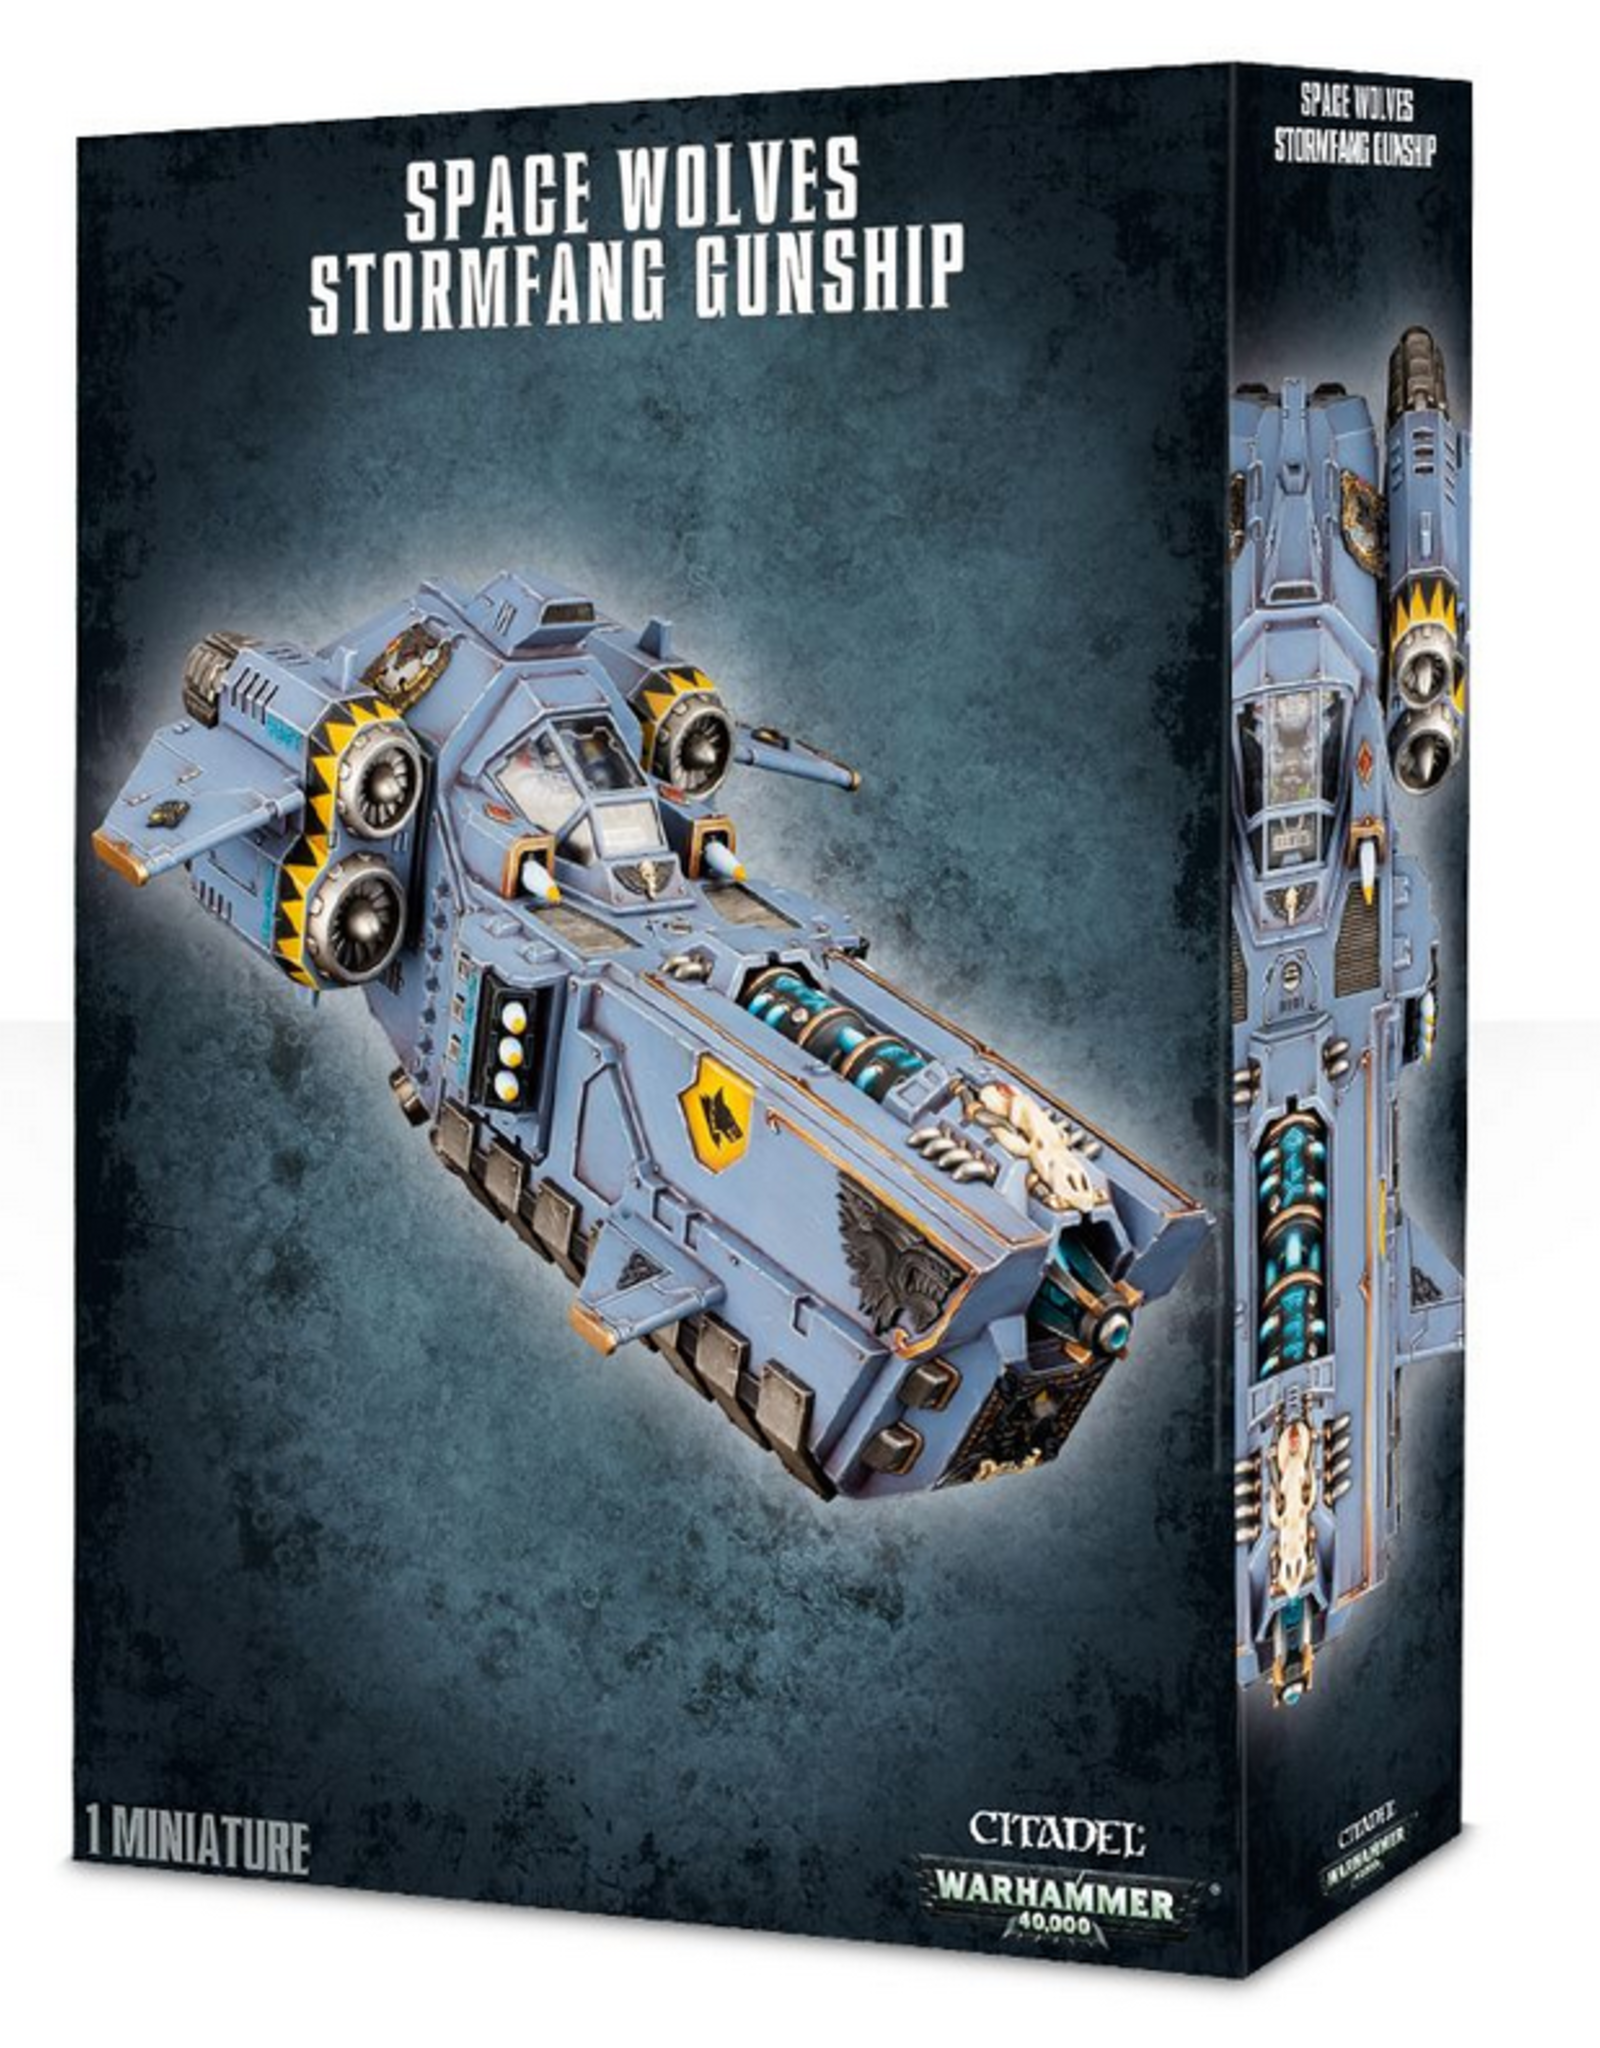 Games Workshop SM: Space Wolves Stormfang Gunship